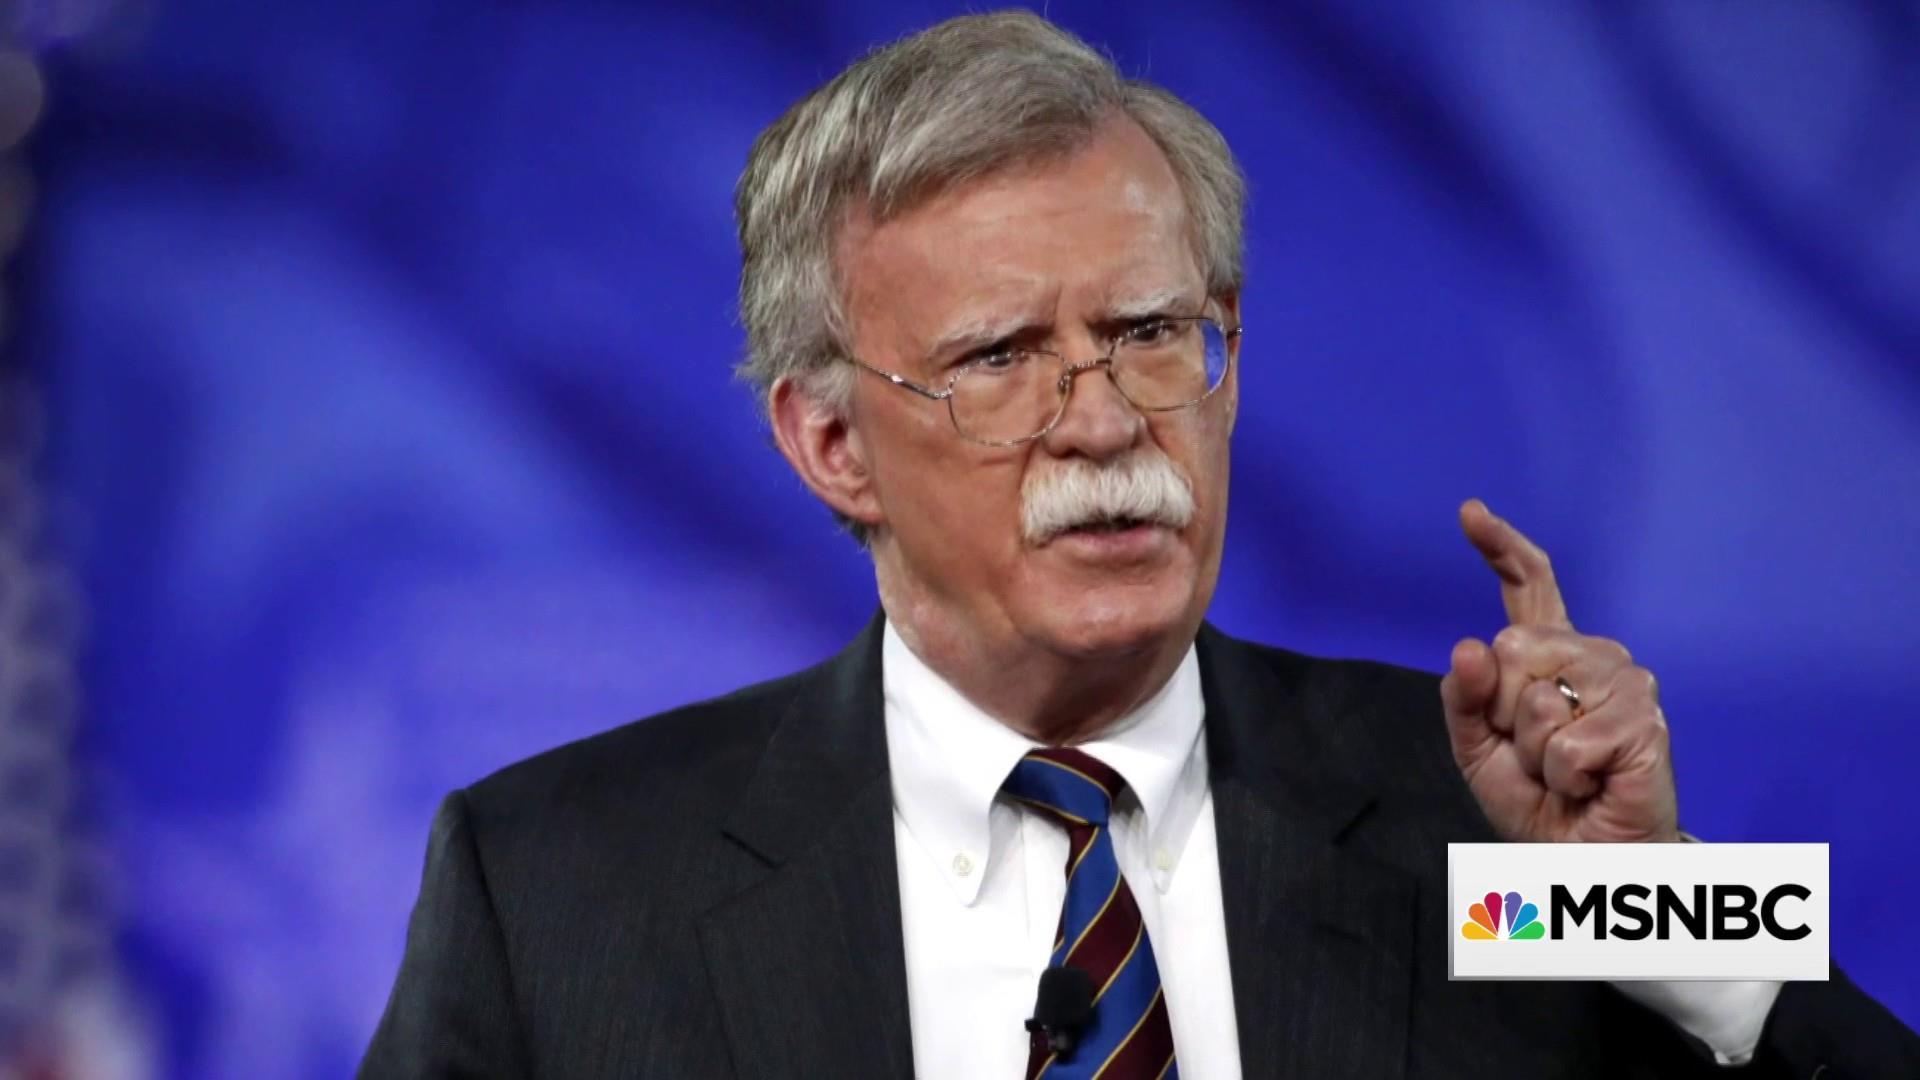 National Security Advisor Bolton compared to 'Yosemite Sam'